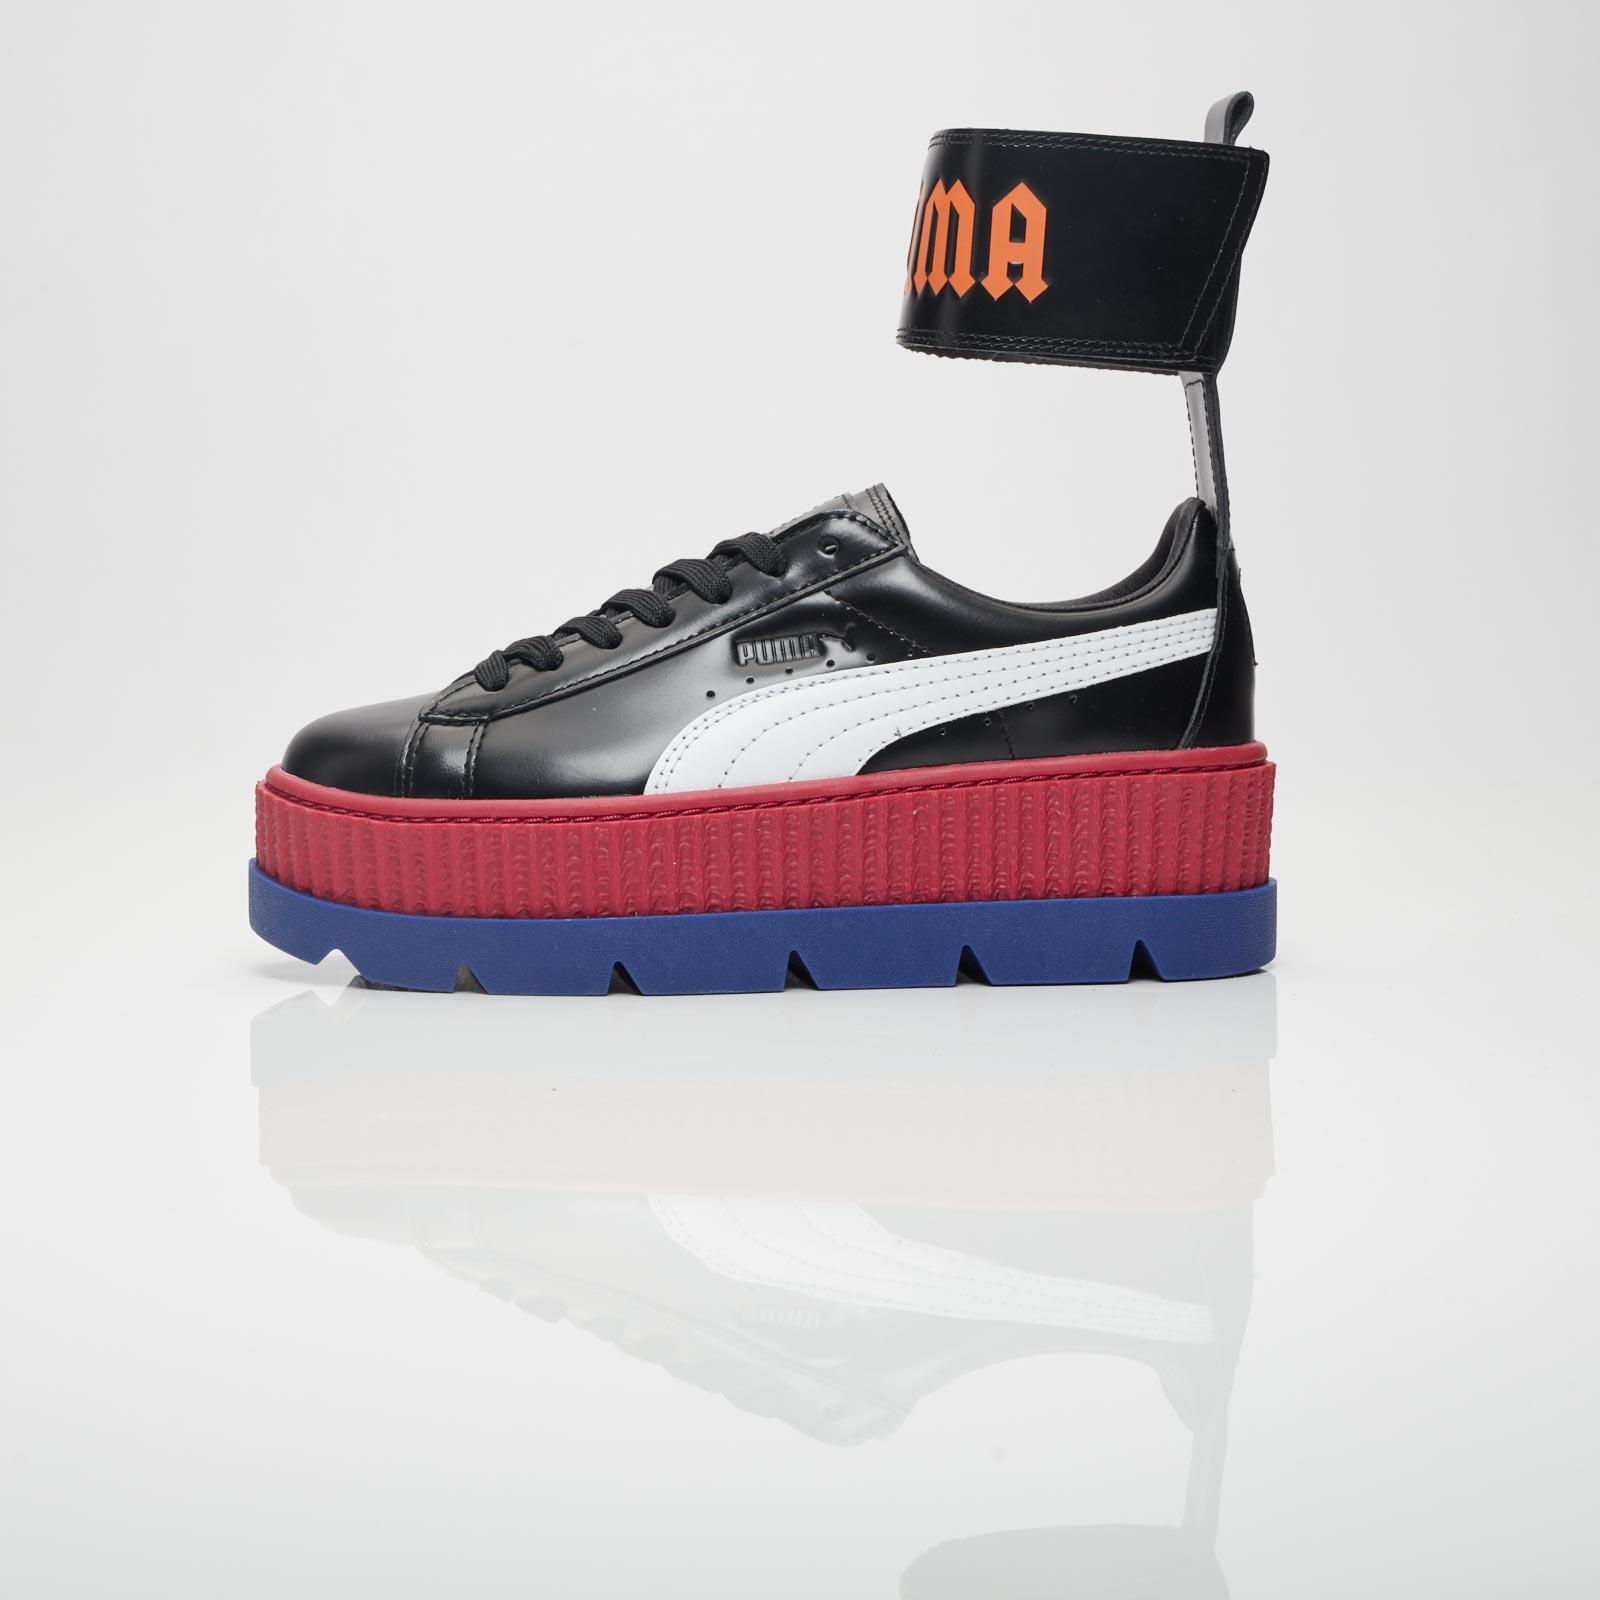 newest 56ee0 53b6c Puma Ankle Strap Sneaker Wns - 366264-01 - Sneakersnstuff ...